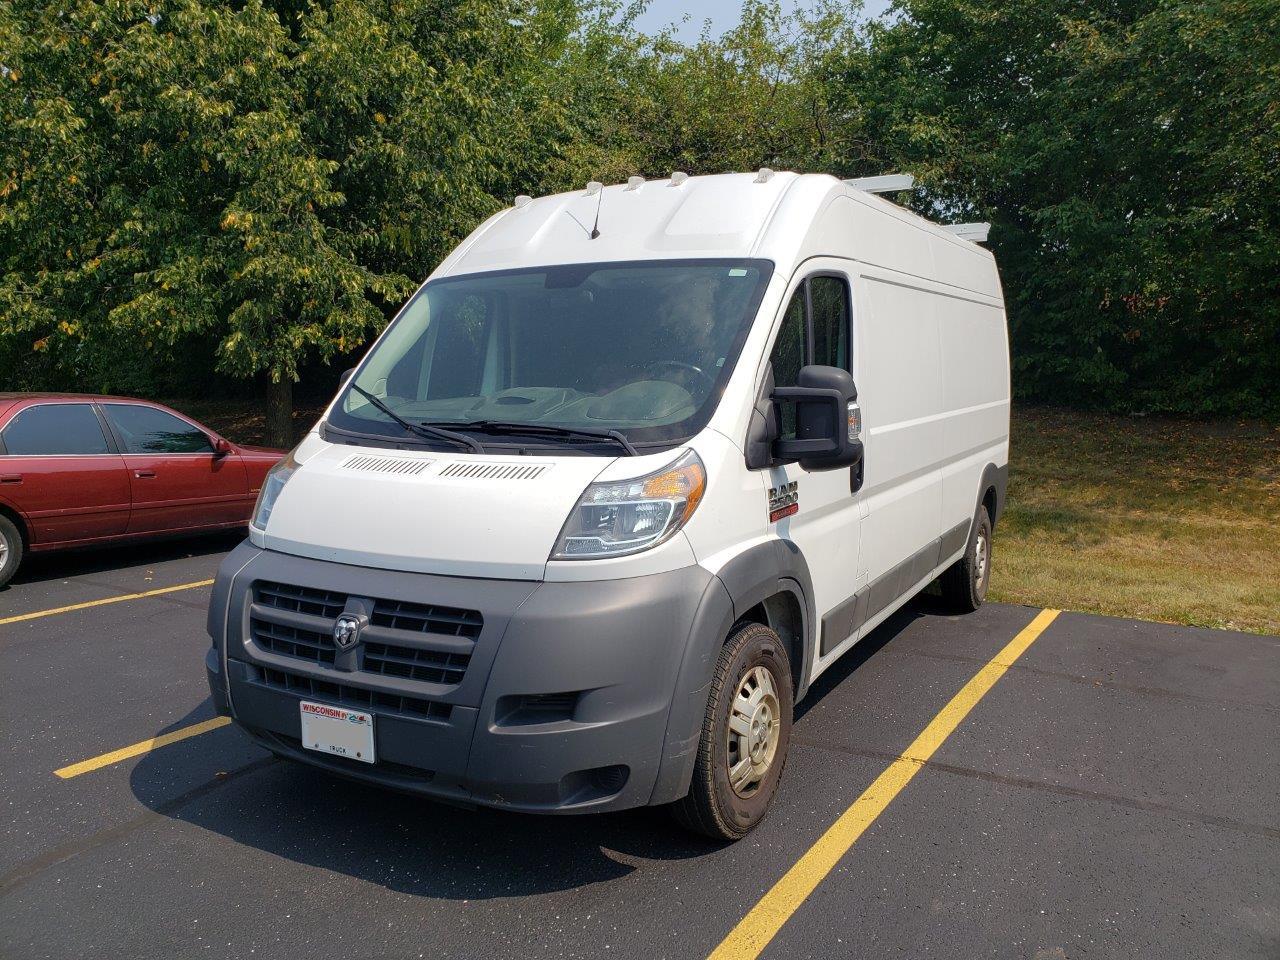 2014 Dodge RAM Promaster 2500 Cargo 159 Wheel Base Diesel